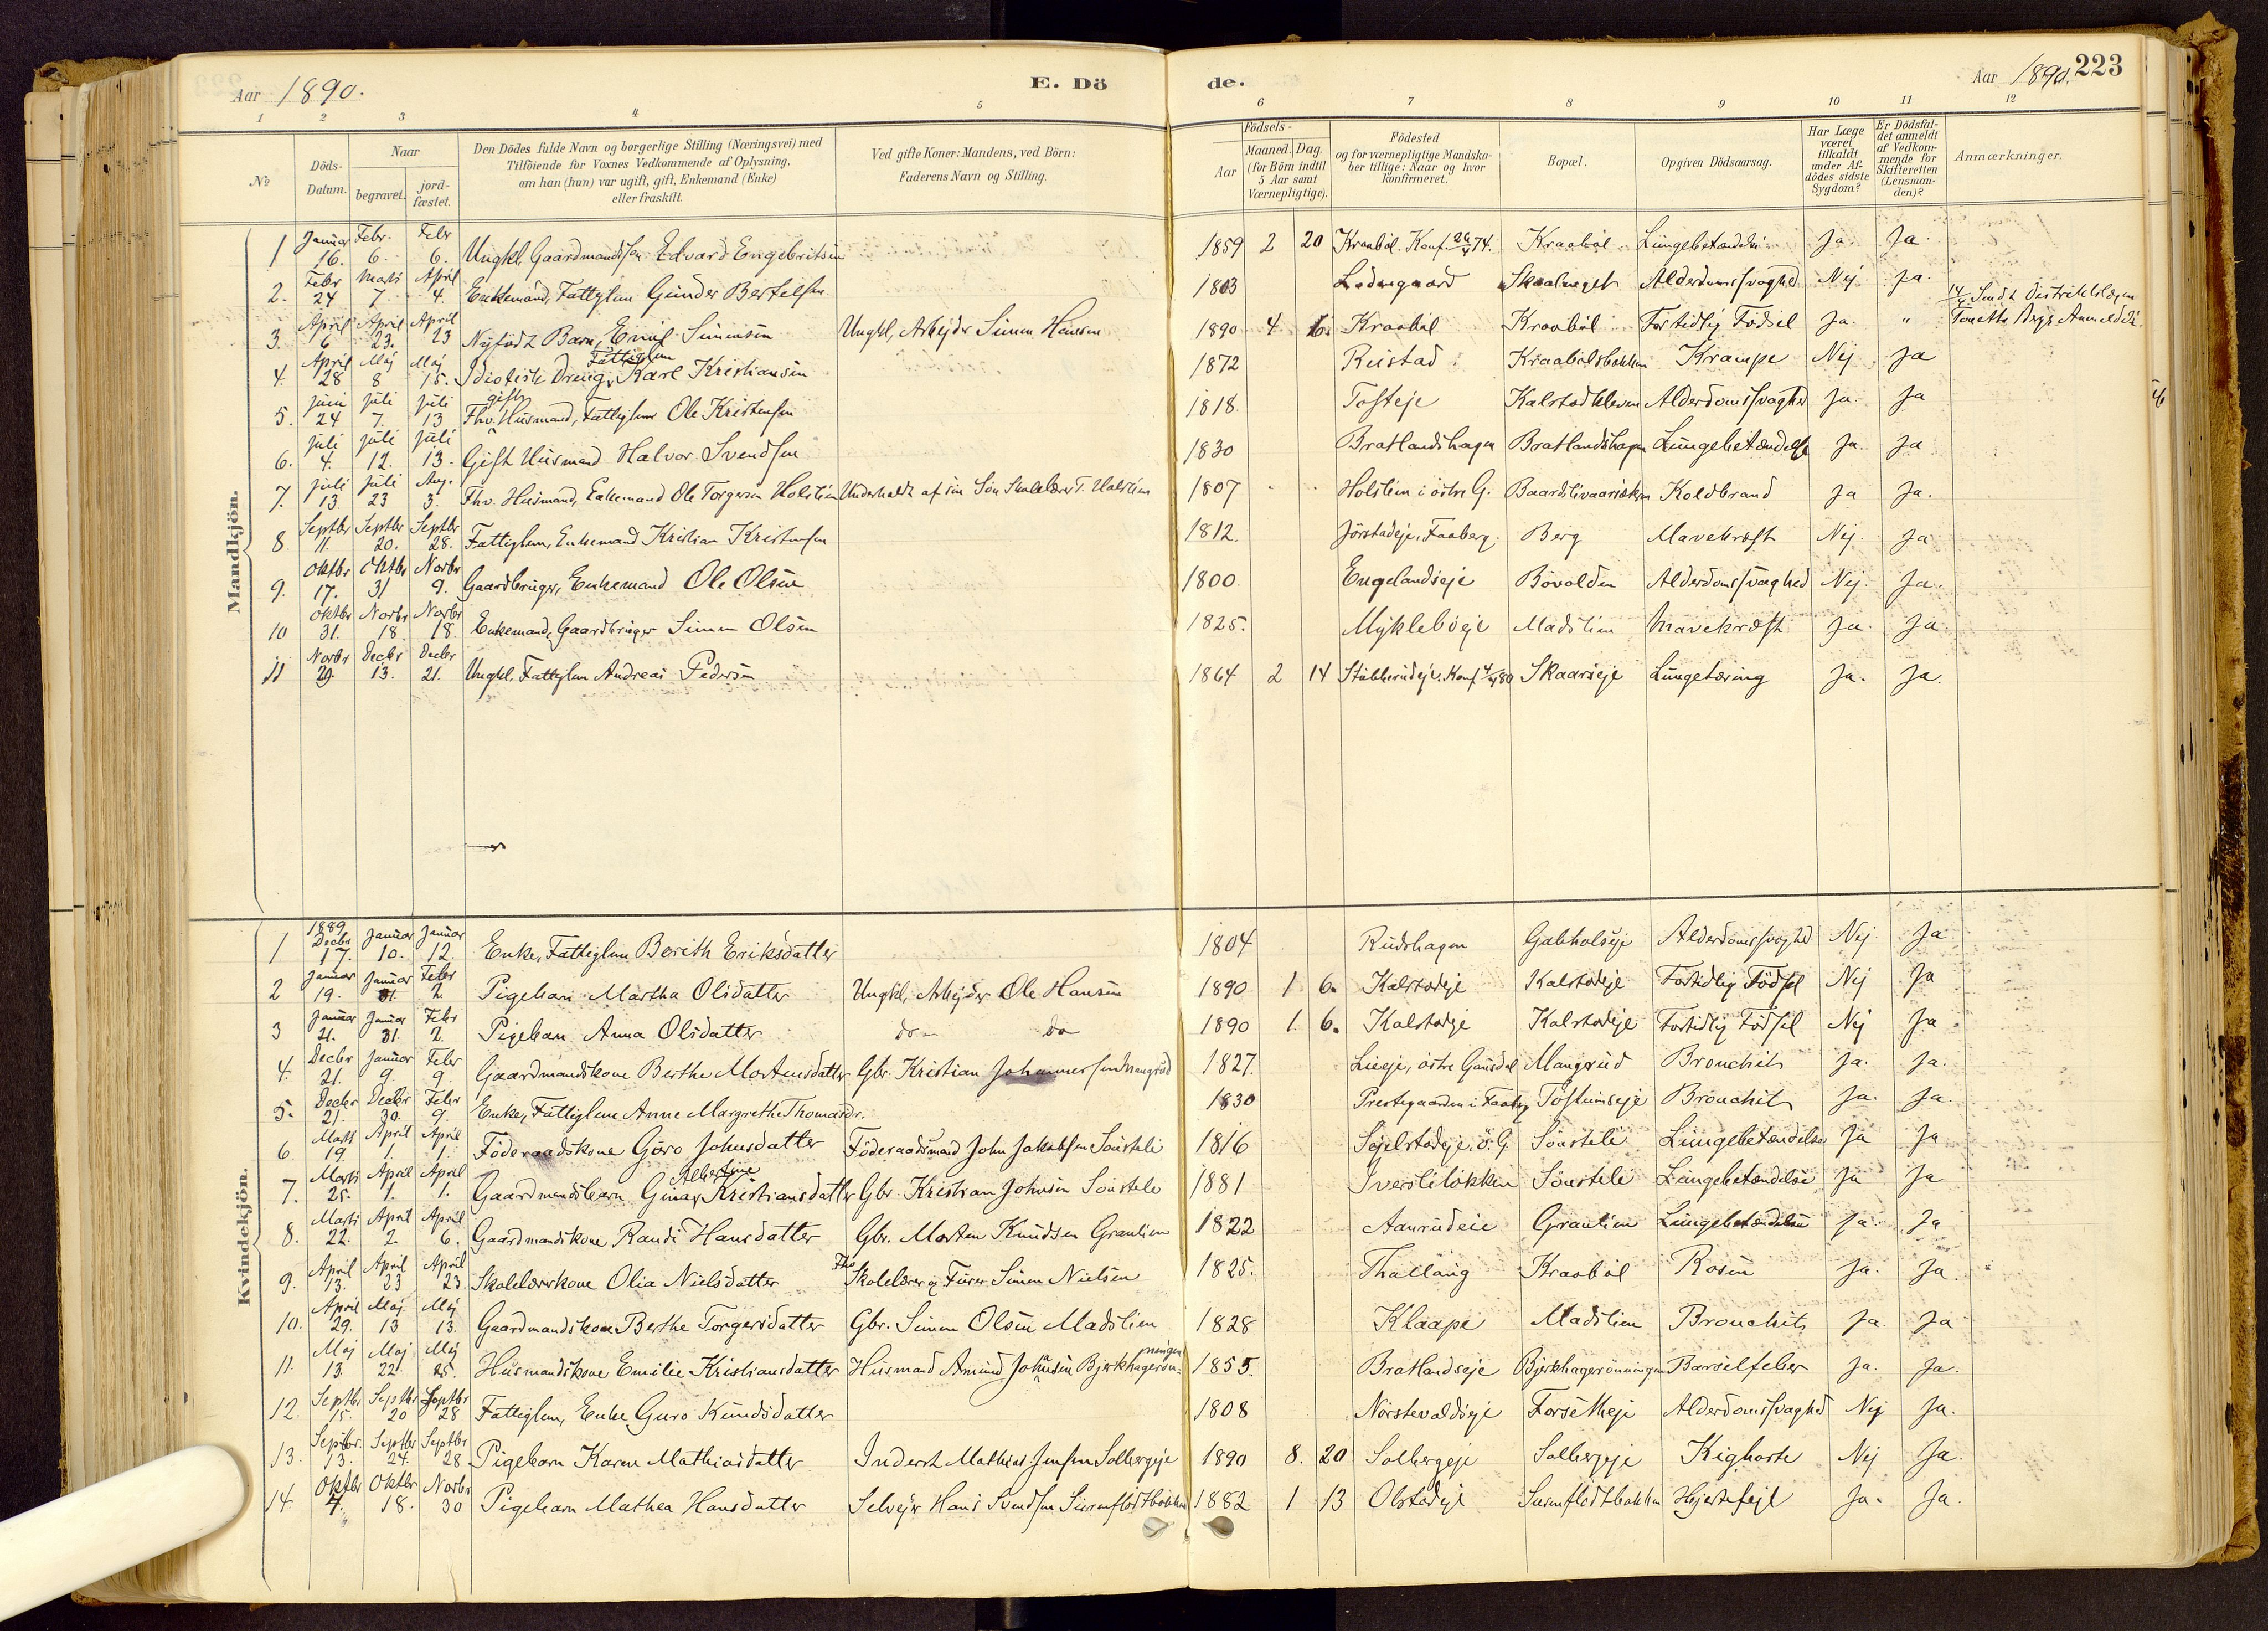 SAH, Vestre Gausdal prestekontor, Ministerialbok nr. 1, 1887-1914, s. 223